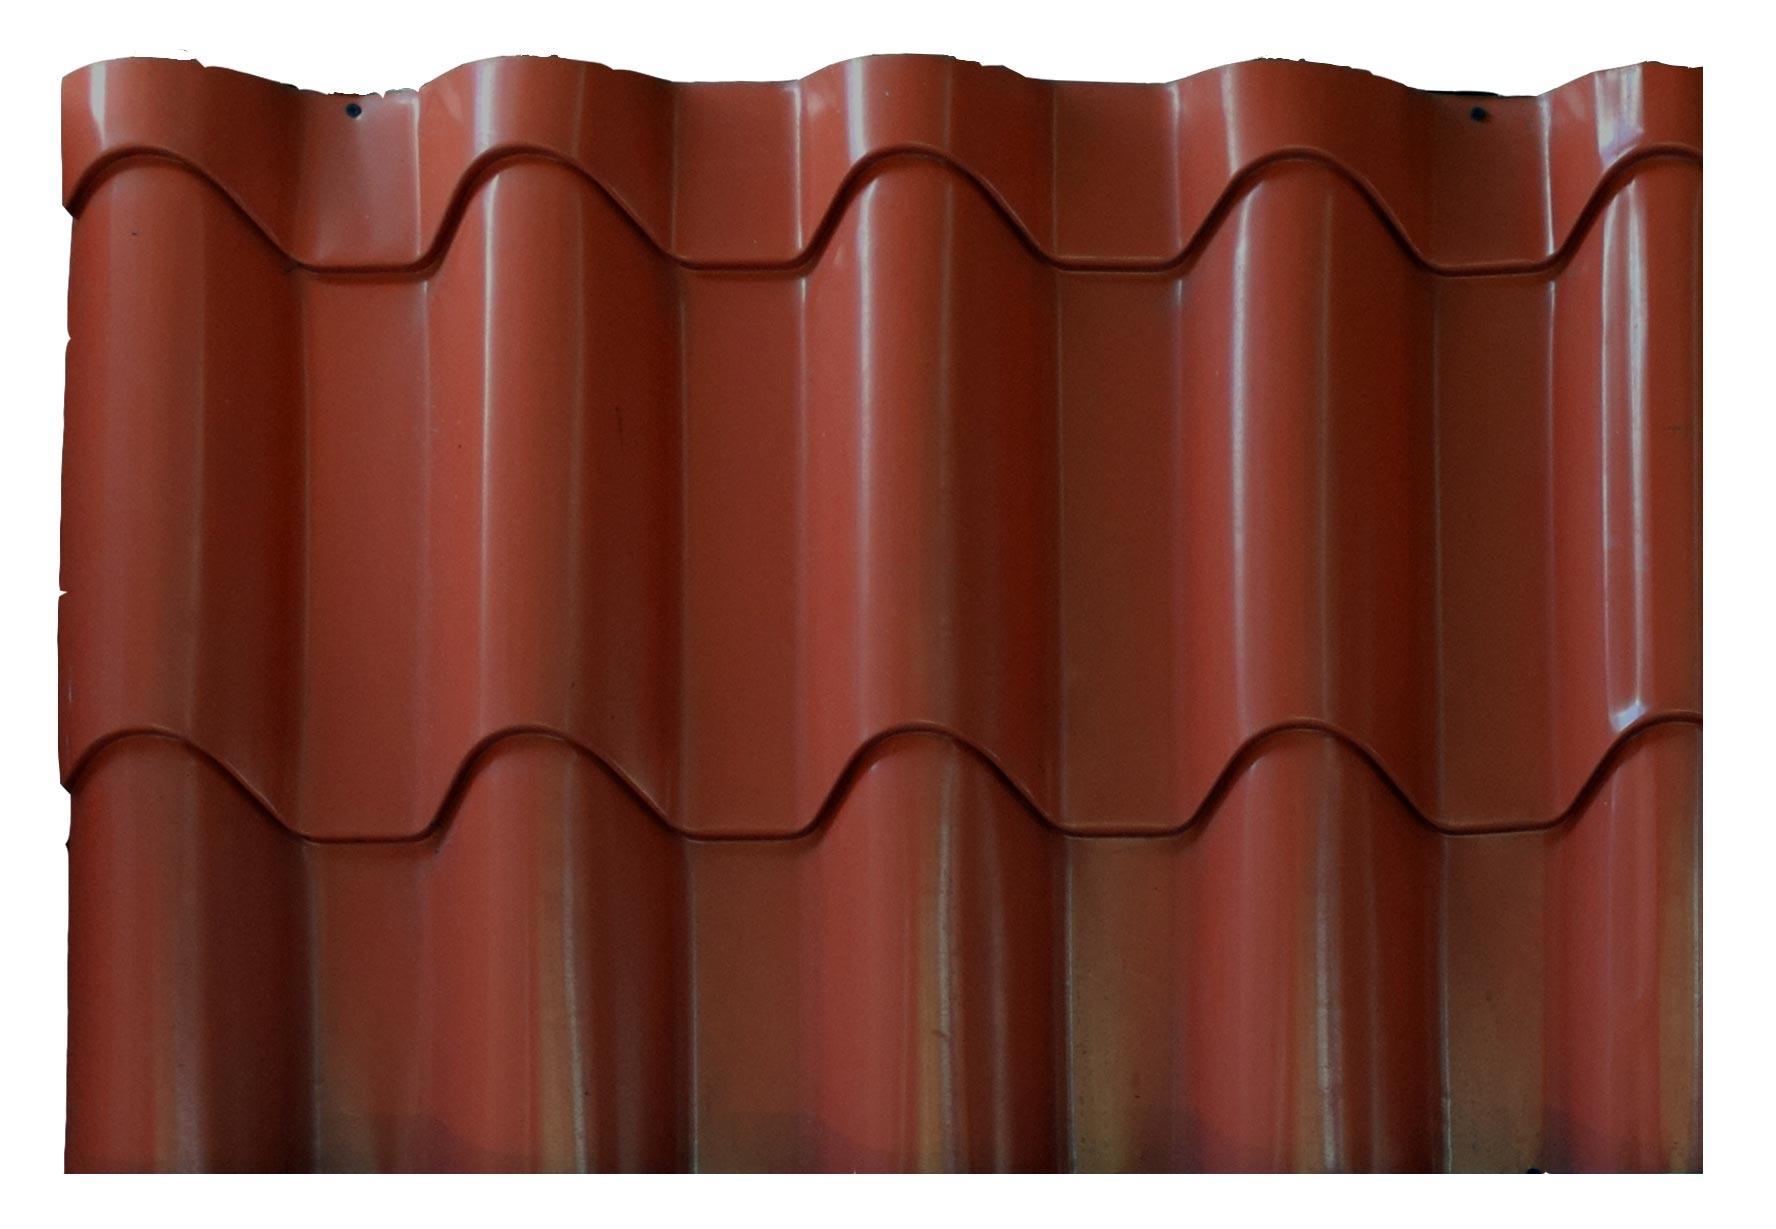 Clay Profile Metal Roof Tiles Dark Brown Finish